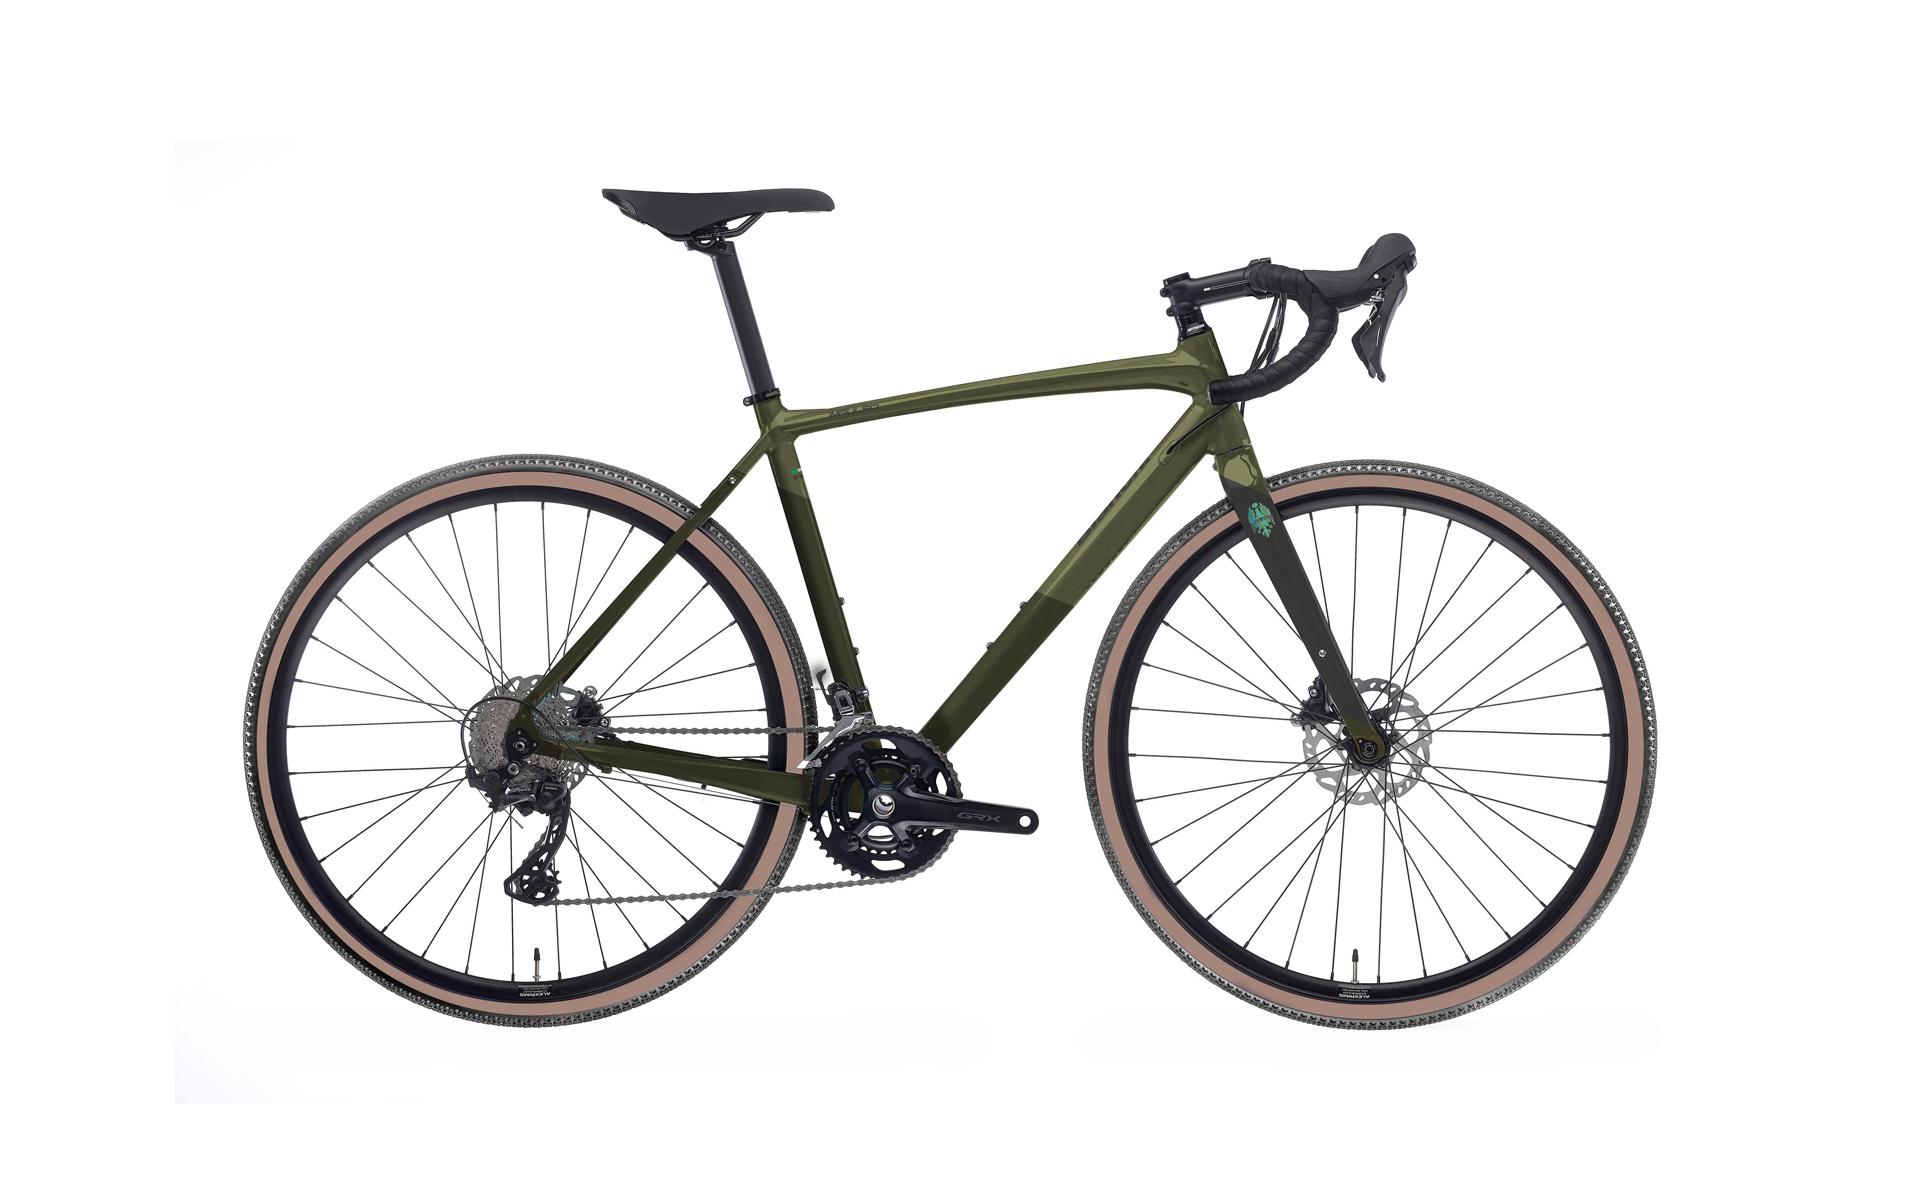 bianchi impulso bike